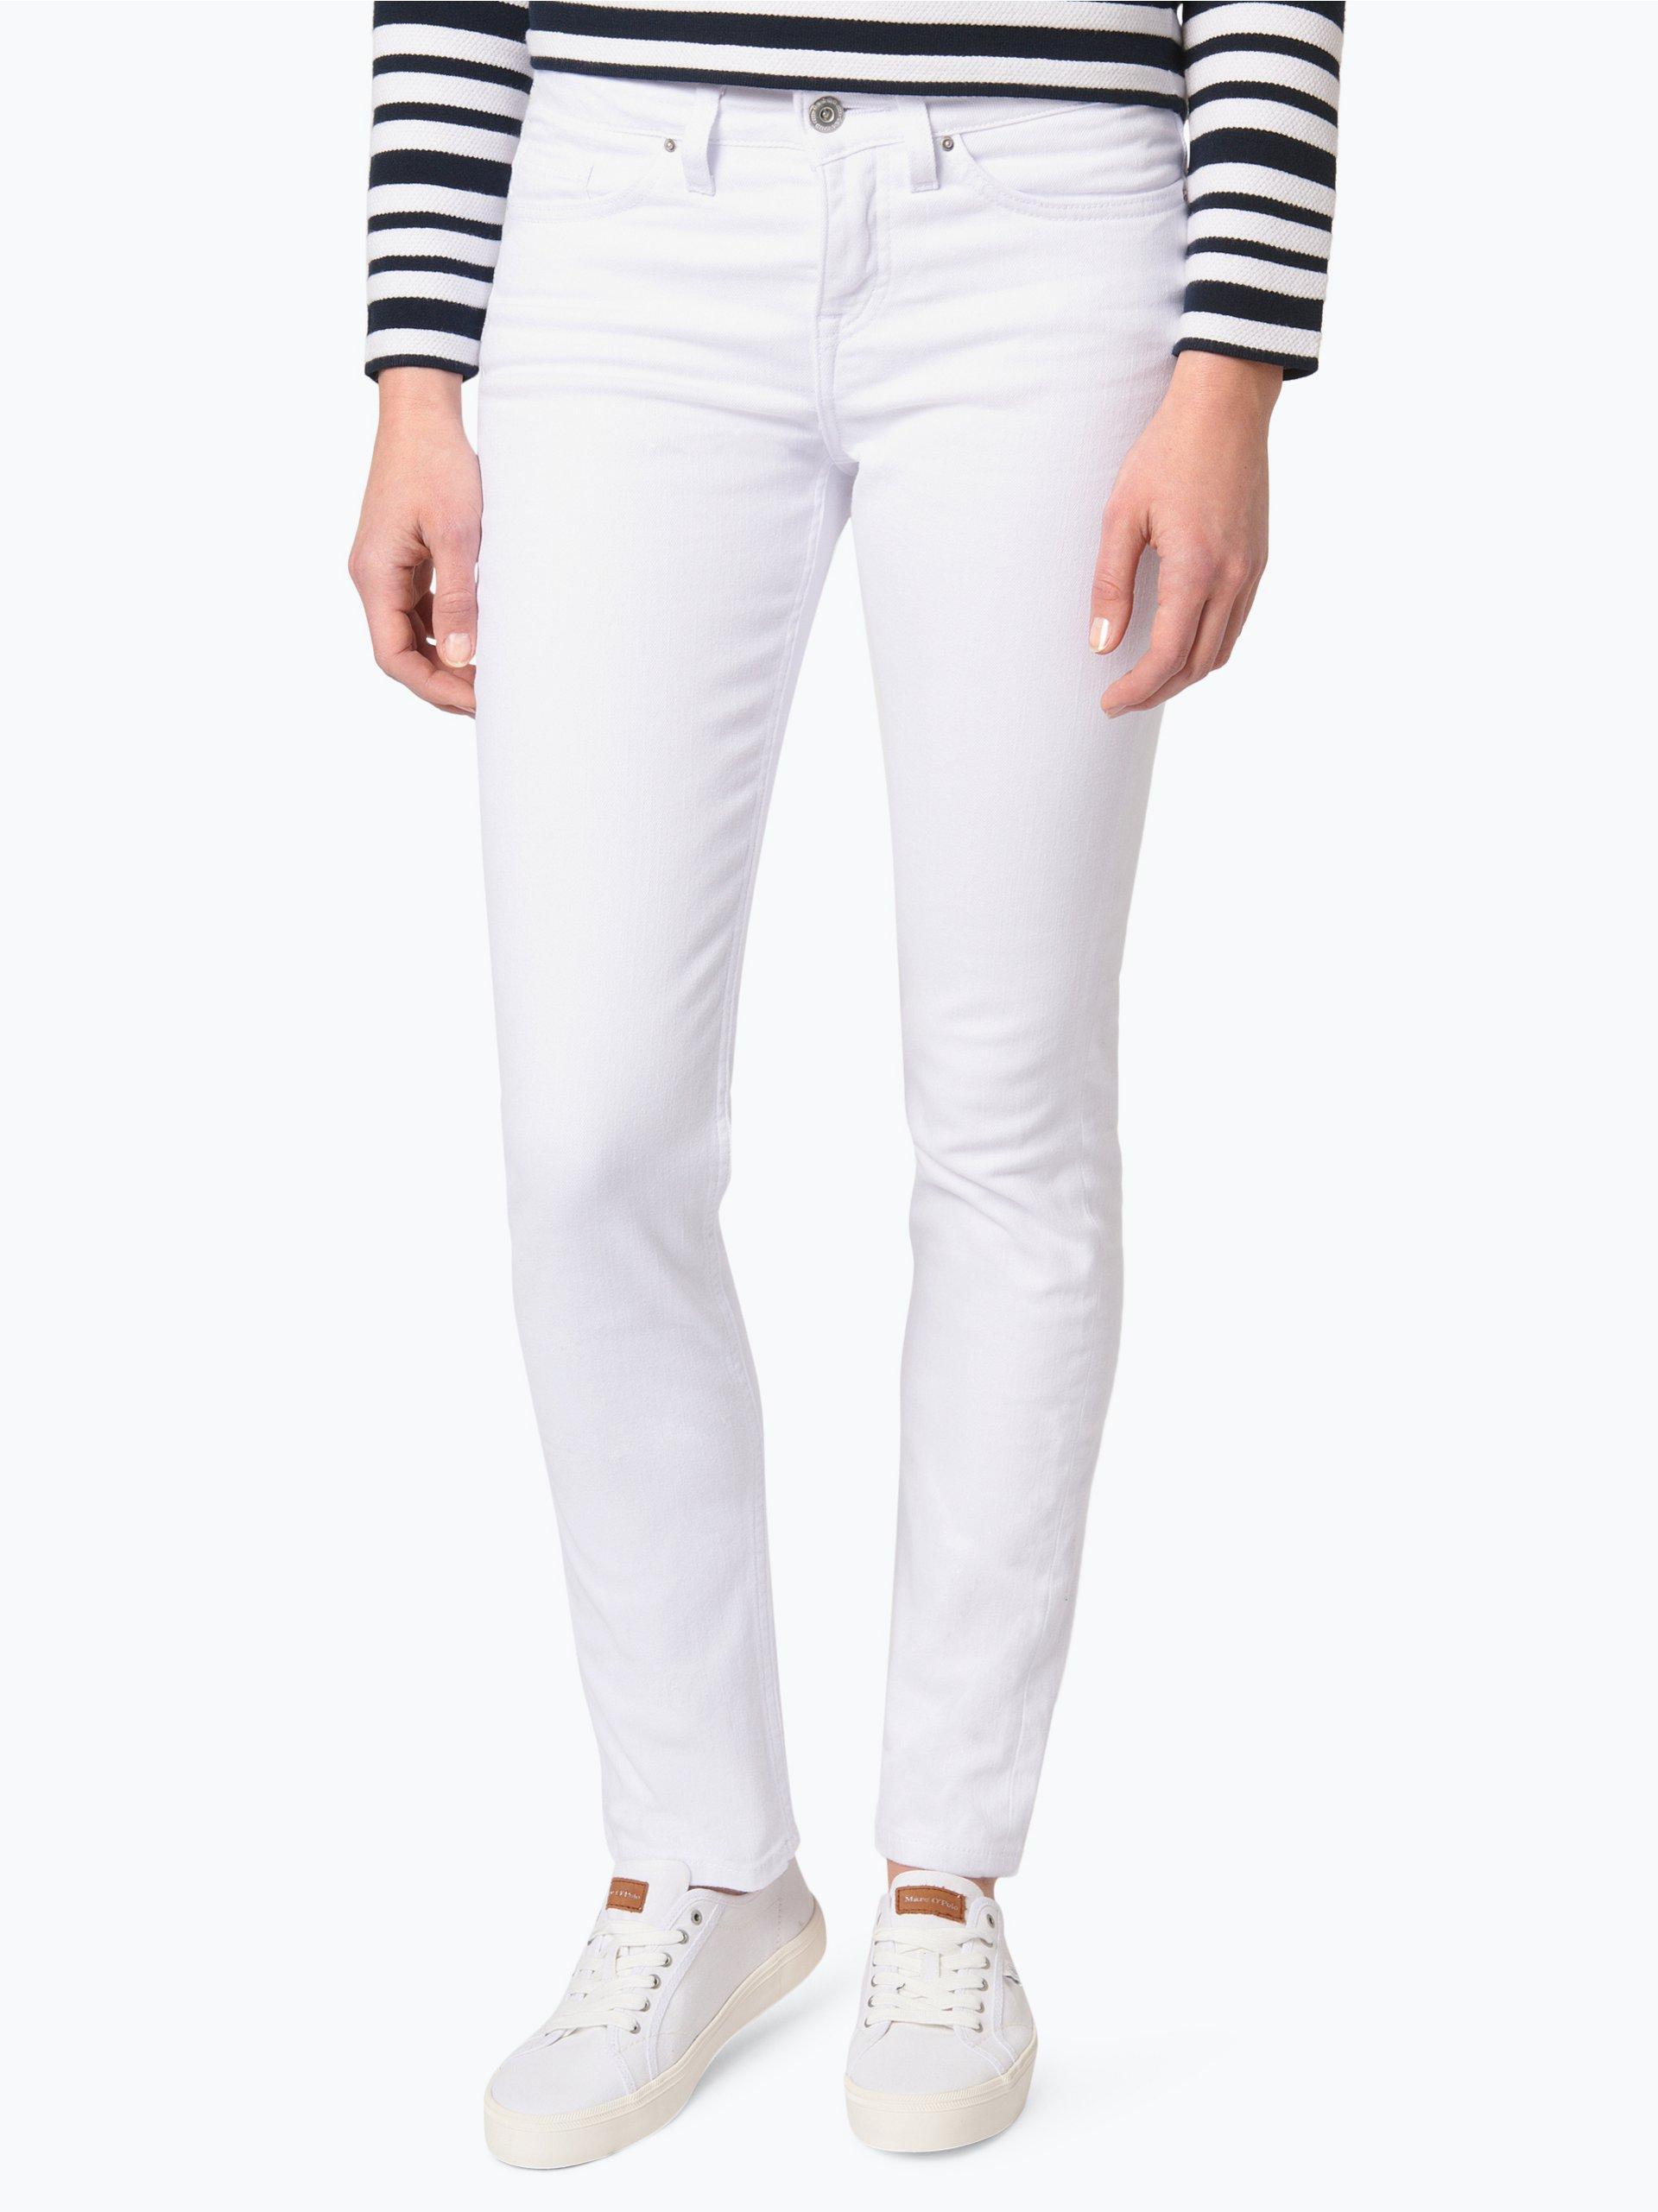 tommy hilfiger damen jeans rome rw online kaufen. Black Bedroom Furniture Sets. Home Design Ideas